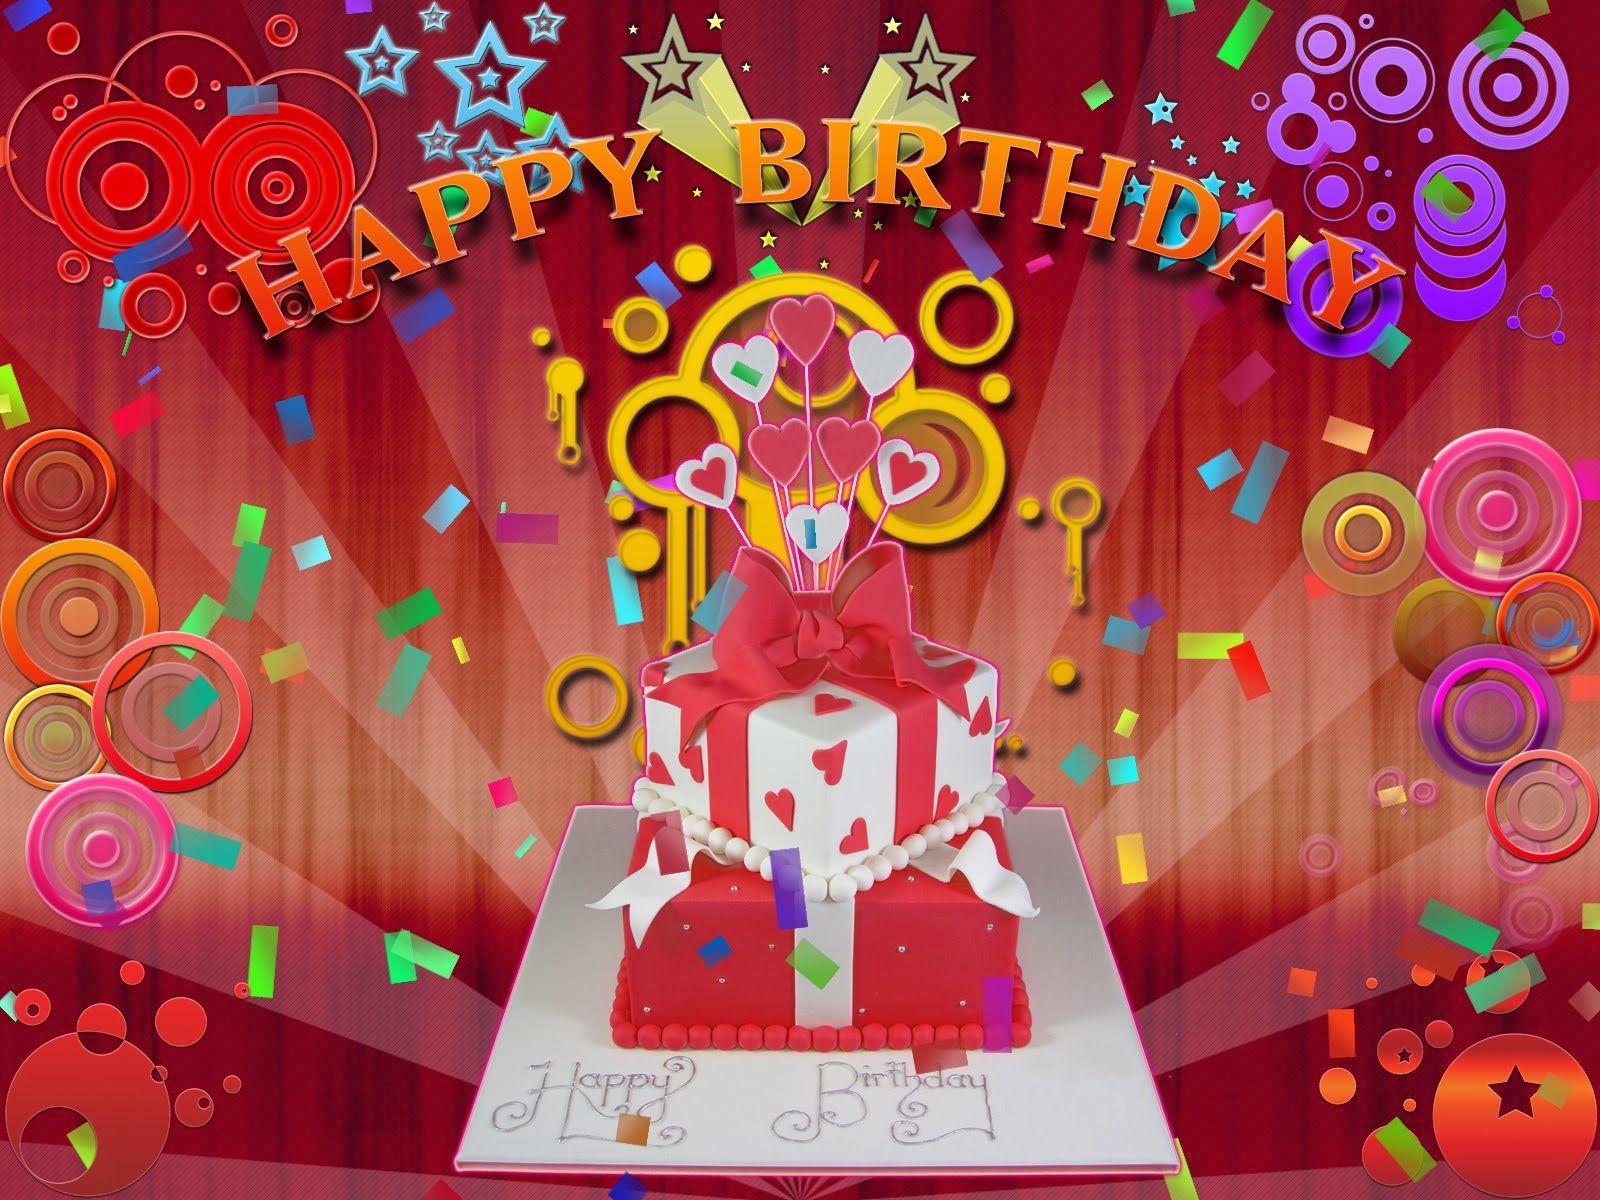 Happy Birthday Gif Tumblr Wallpaper 3 (1600×1200)